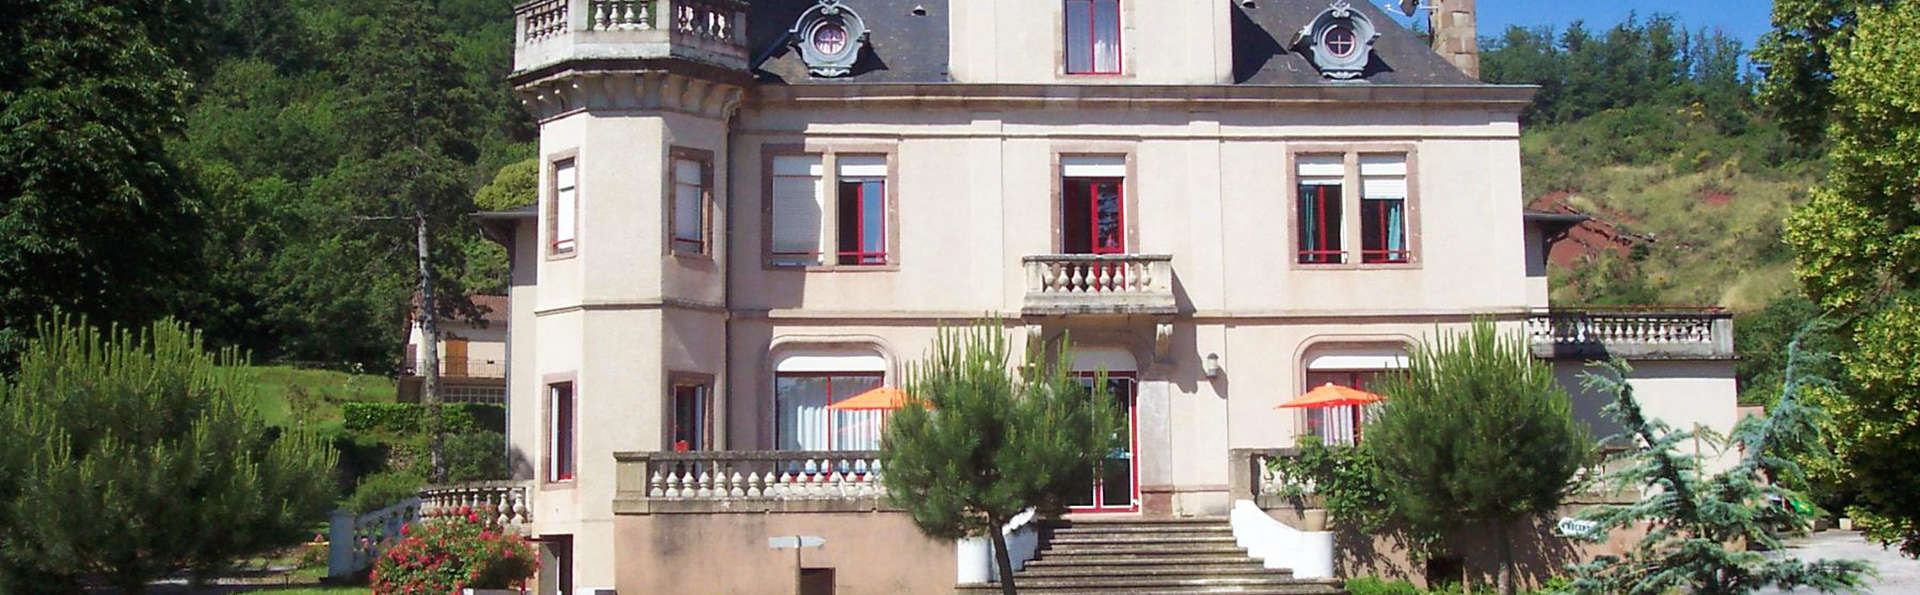 Hôtel Résidence du Rougier - EDIT-Fachada-4.jpg